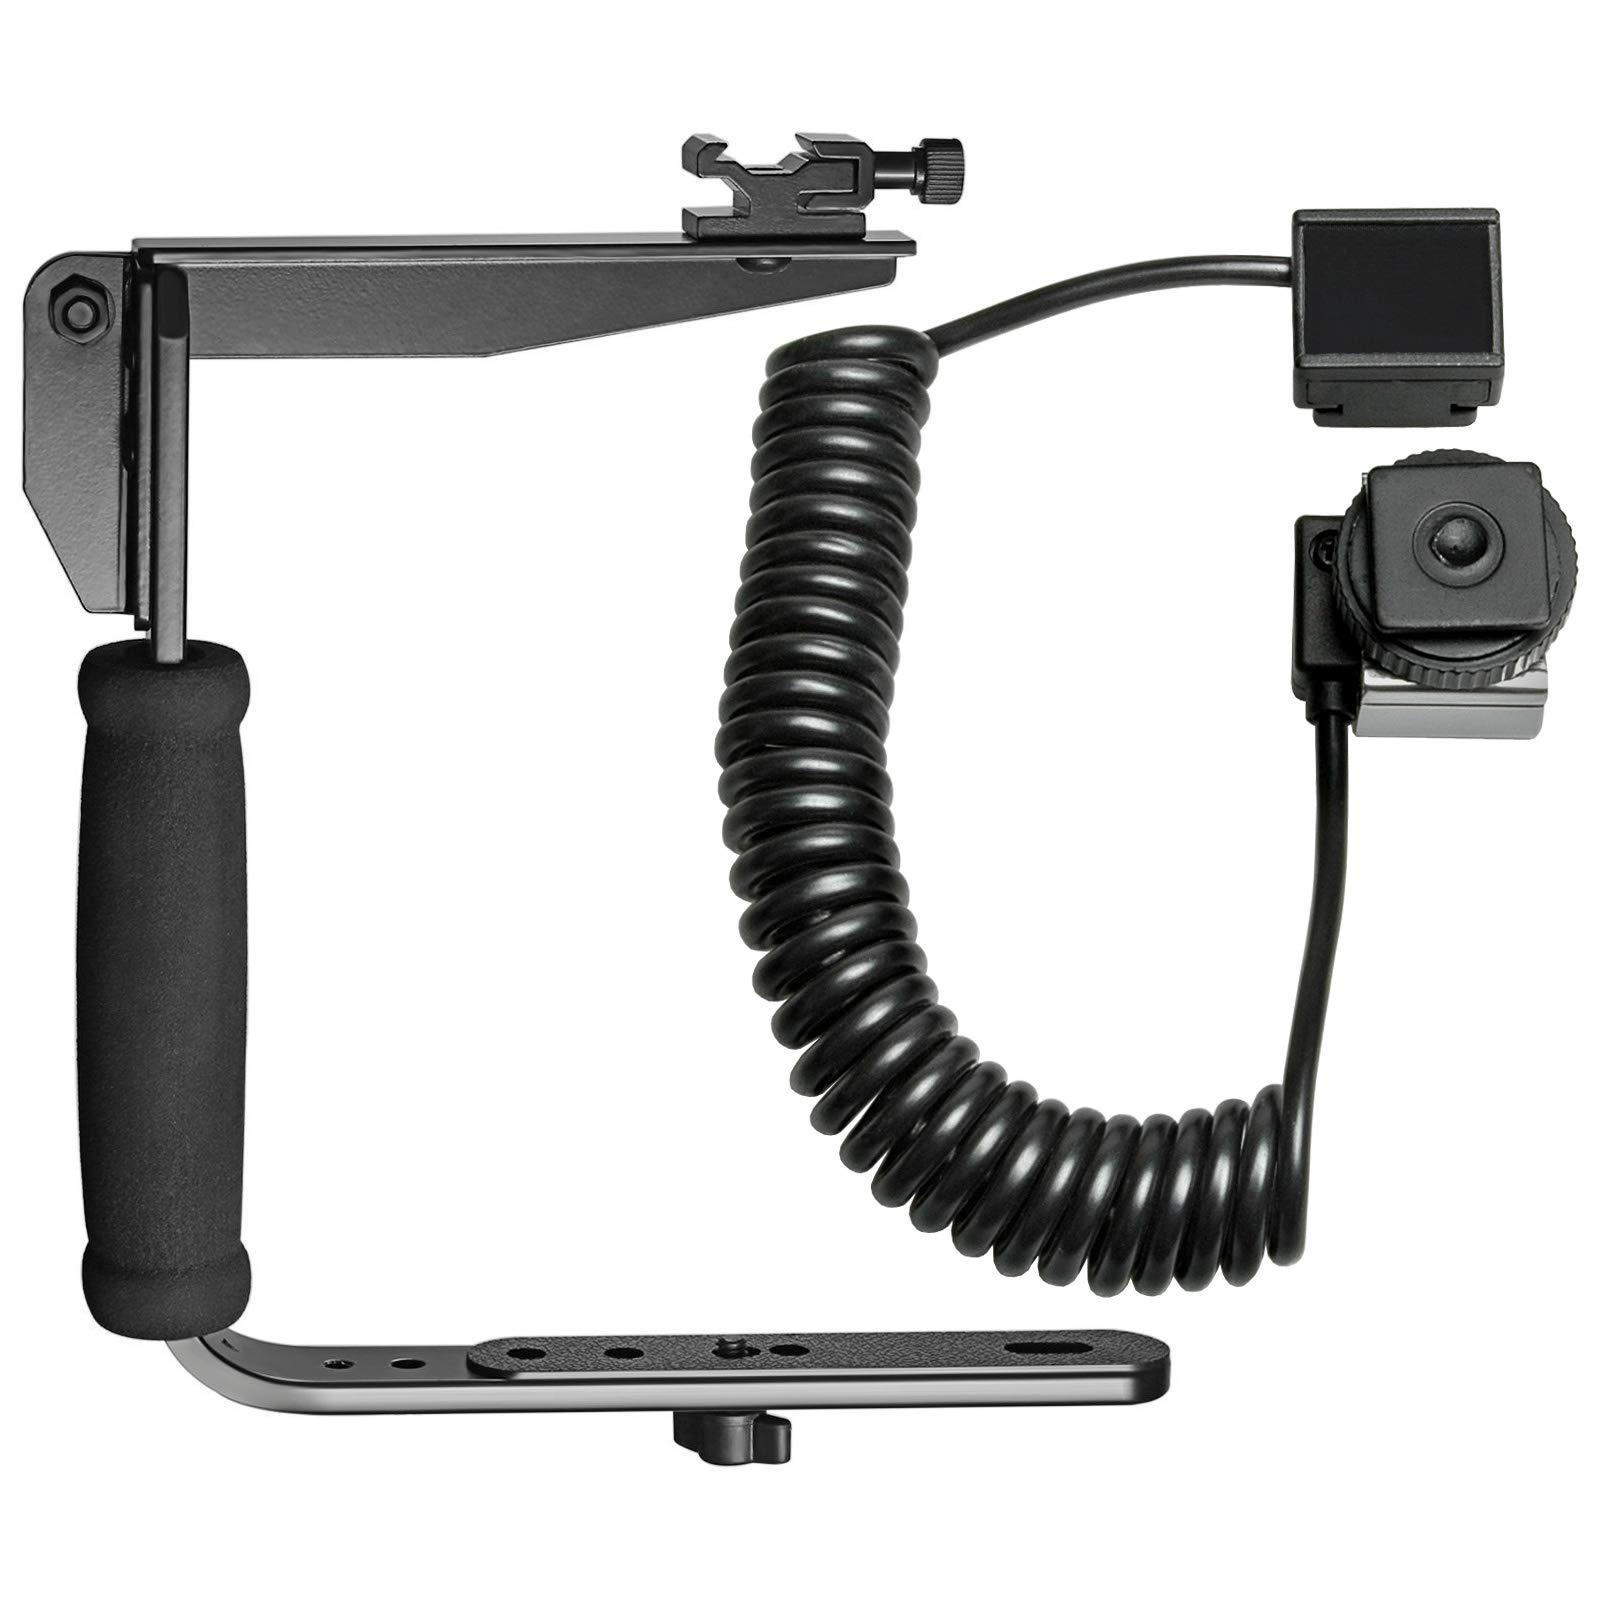 Vidpro VB-6 Rotating Arm Flash Bracket with i-TTL Off-Camera Flash Cord for Nikon Digital SLR Cameras